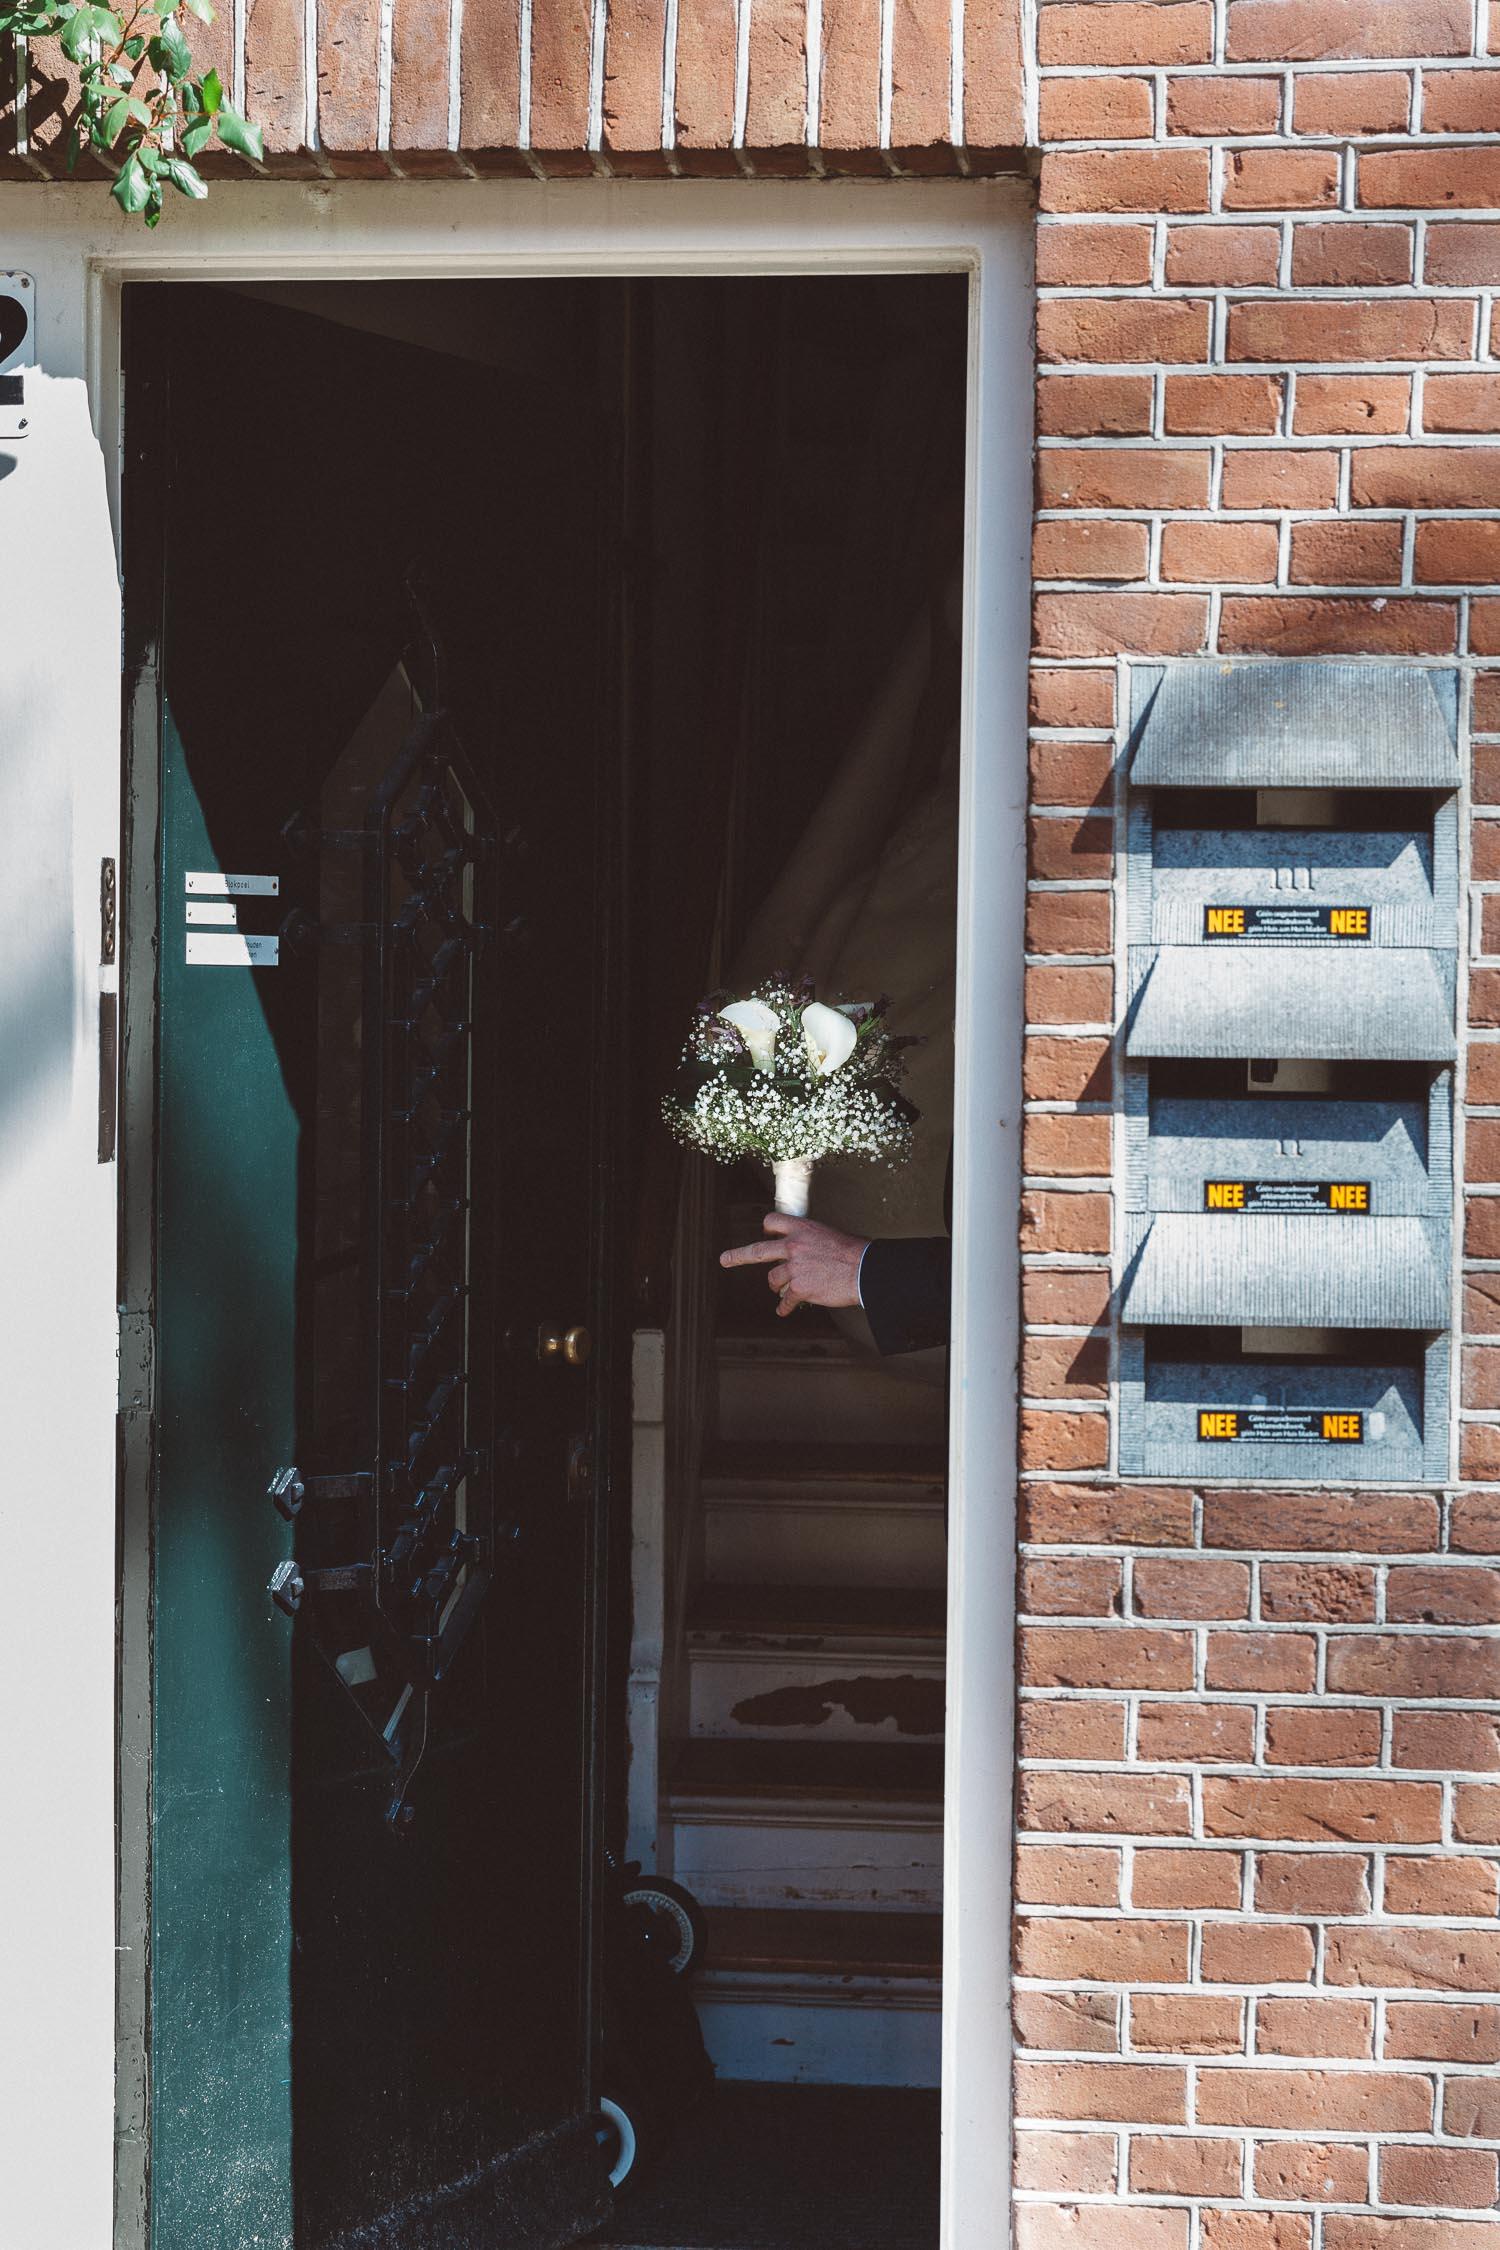 Wedding-huwelijk-trouwen-bruiloft-photography-fotografie-fotograaf-photographer-Rijksmuseum-College-Hotel-On-a-hazy-morning-Amsterdam-The-Netherlands-59.jpg